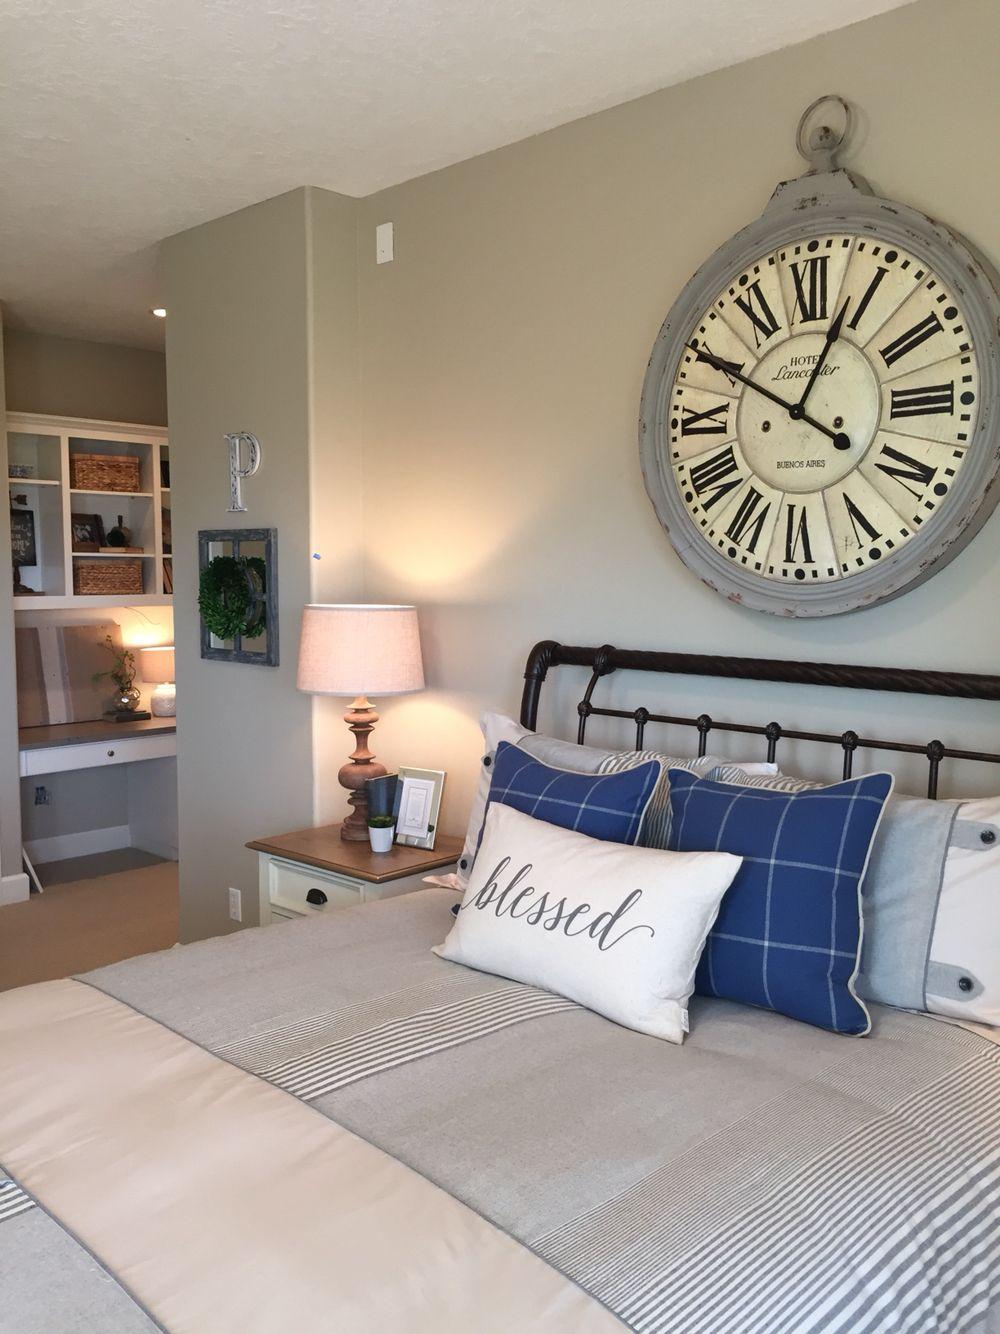 Interior Design Of Guest Room: Cozy Guest Room. Interior Design By Janna Allbritton Of